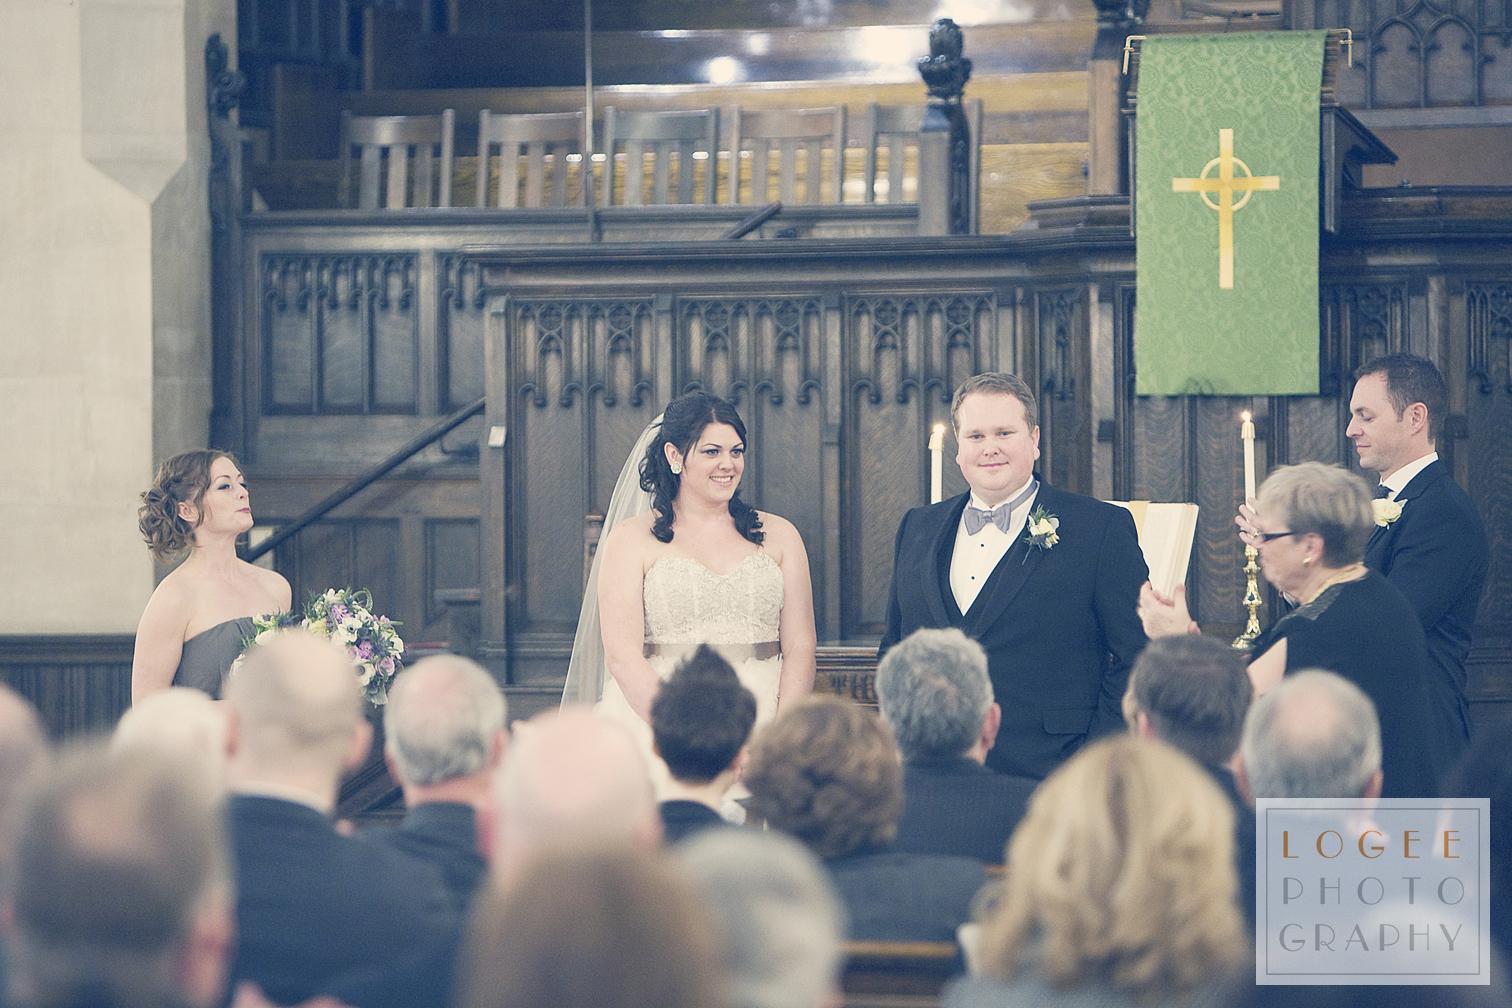 McIntosh-Burns Wedding - 6757-7682Cw